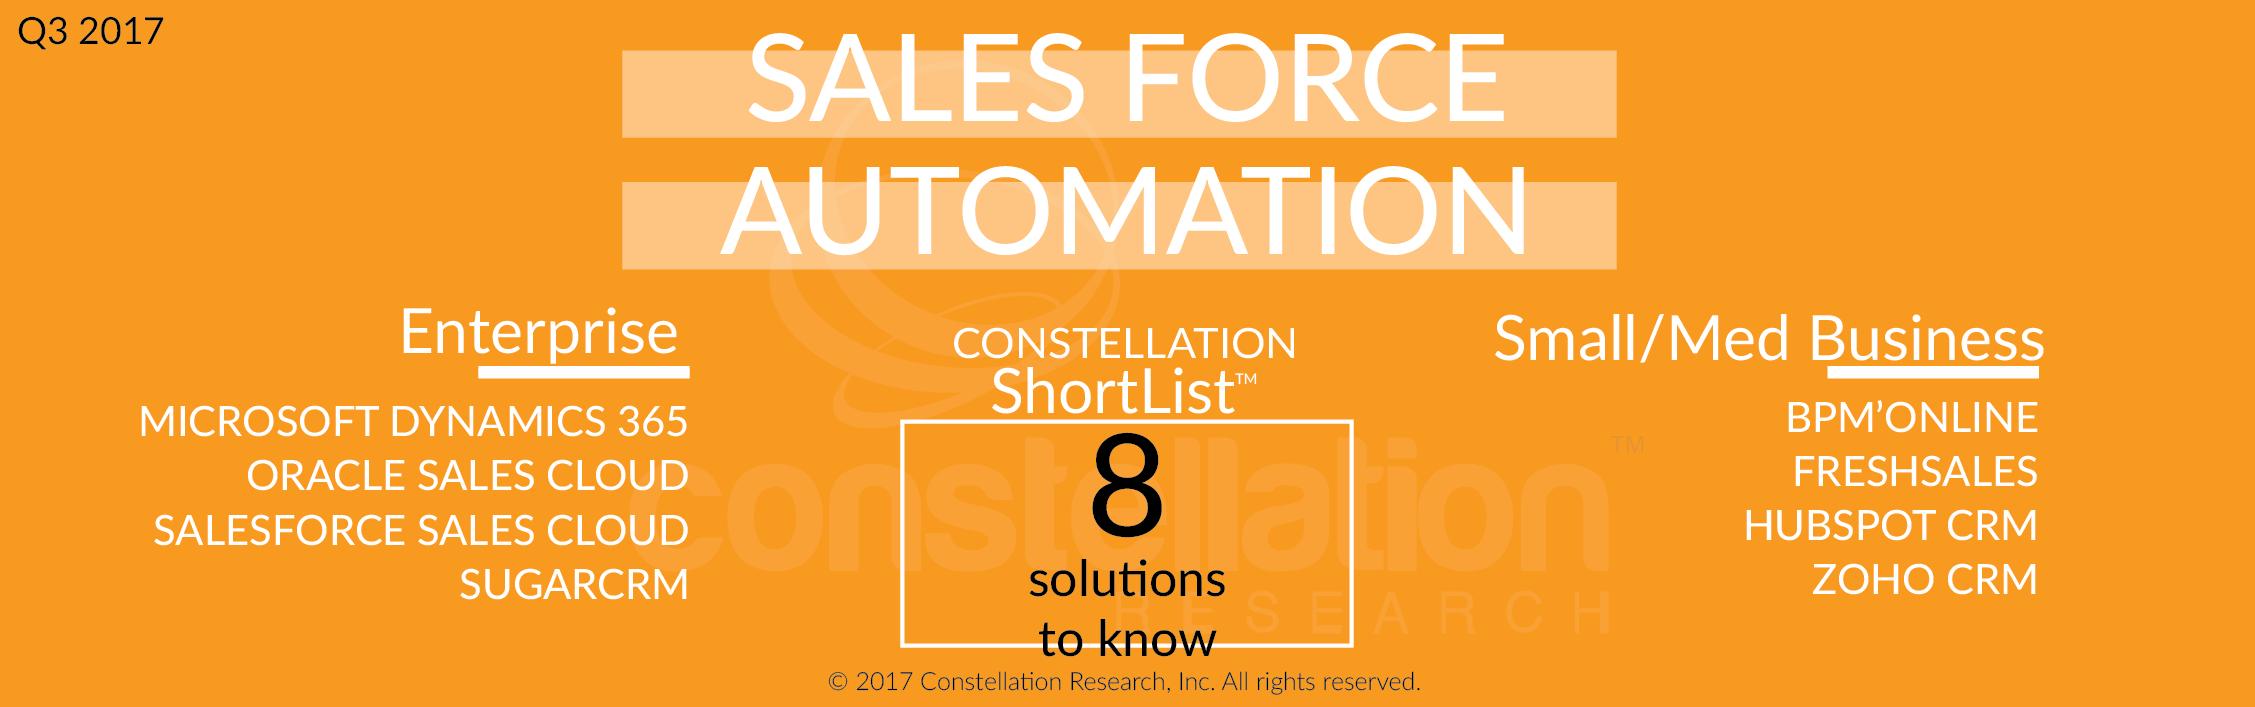 Constellation ShortList Sales Force Automation